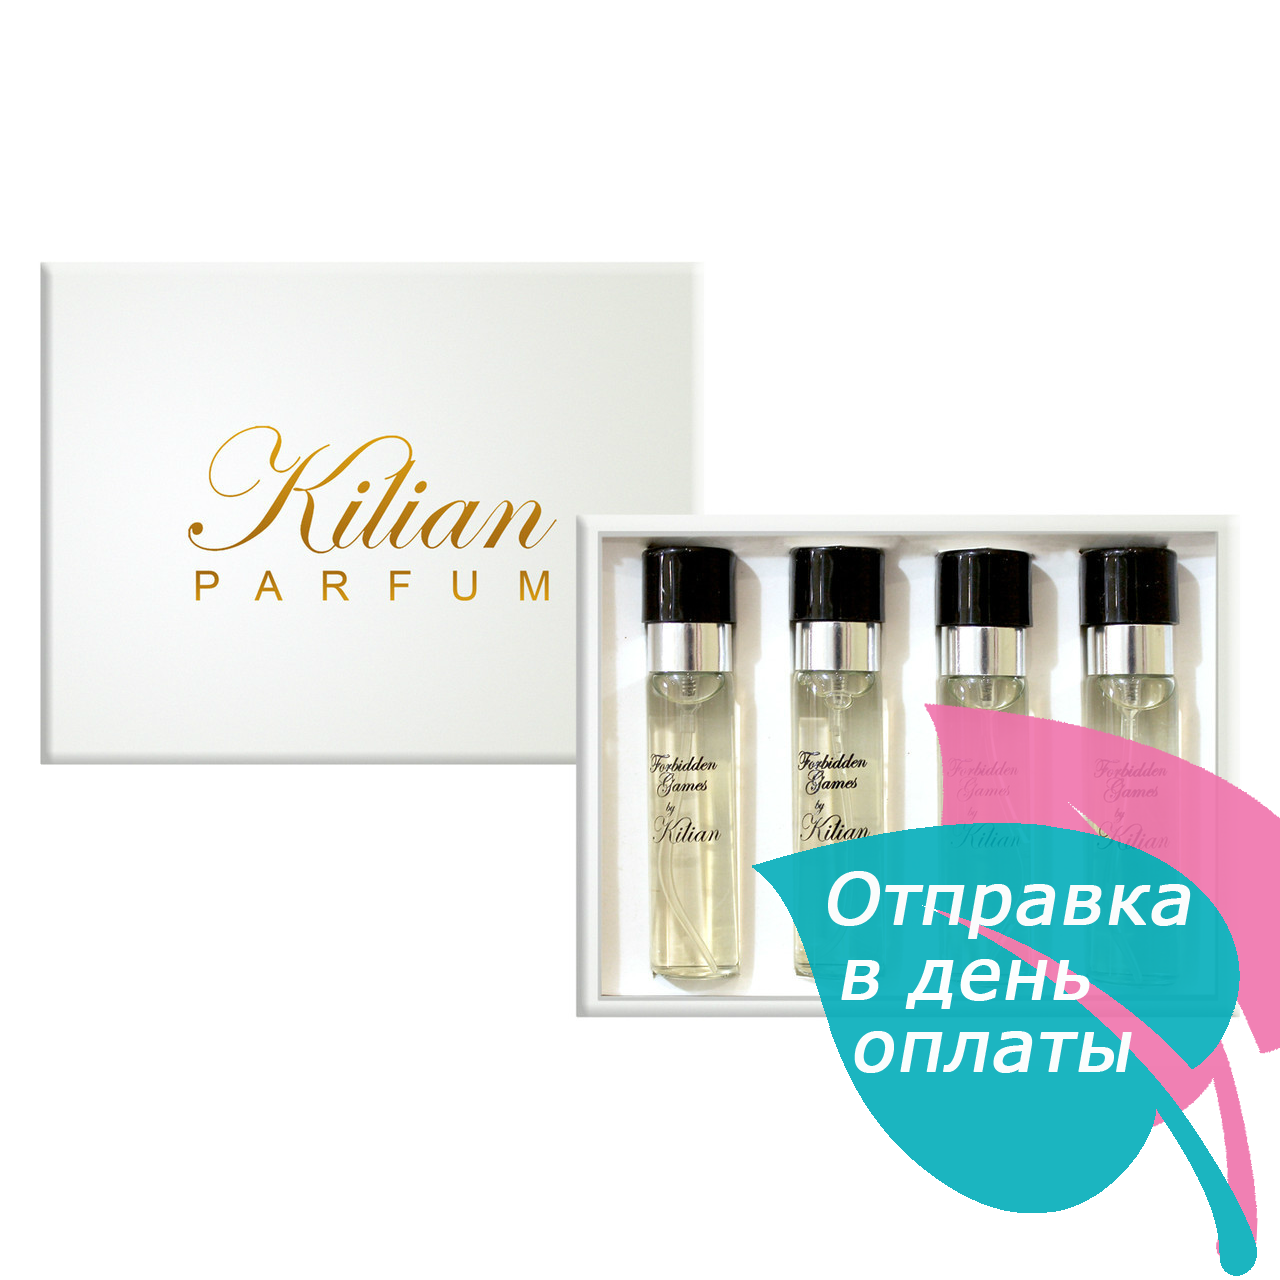 Набор мини-парфюмов женских Kilian Forbidden Games (Форбидэн Геймс) 4*20 мл